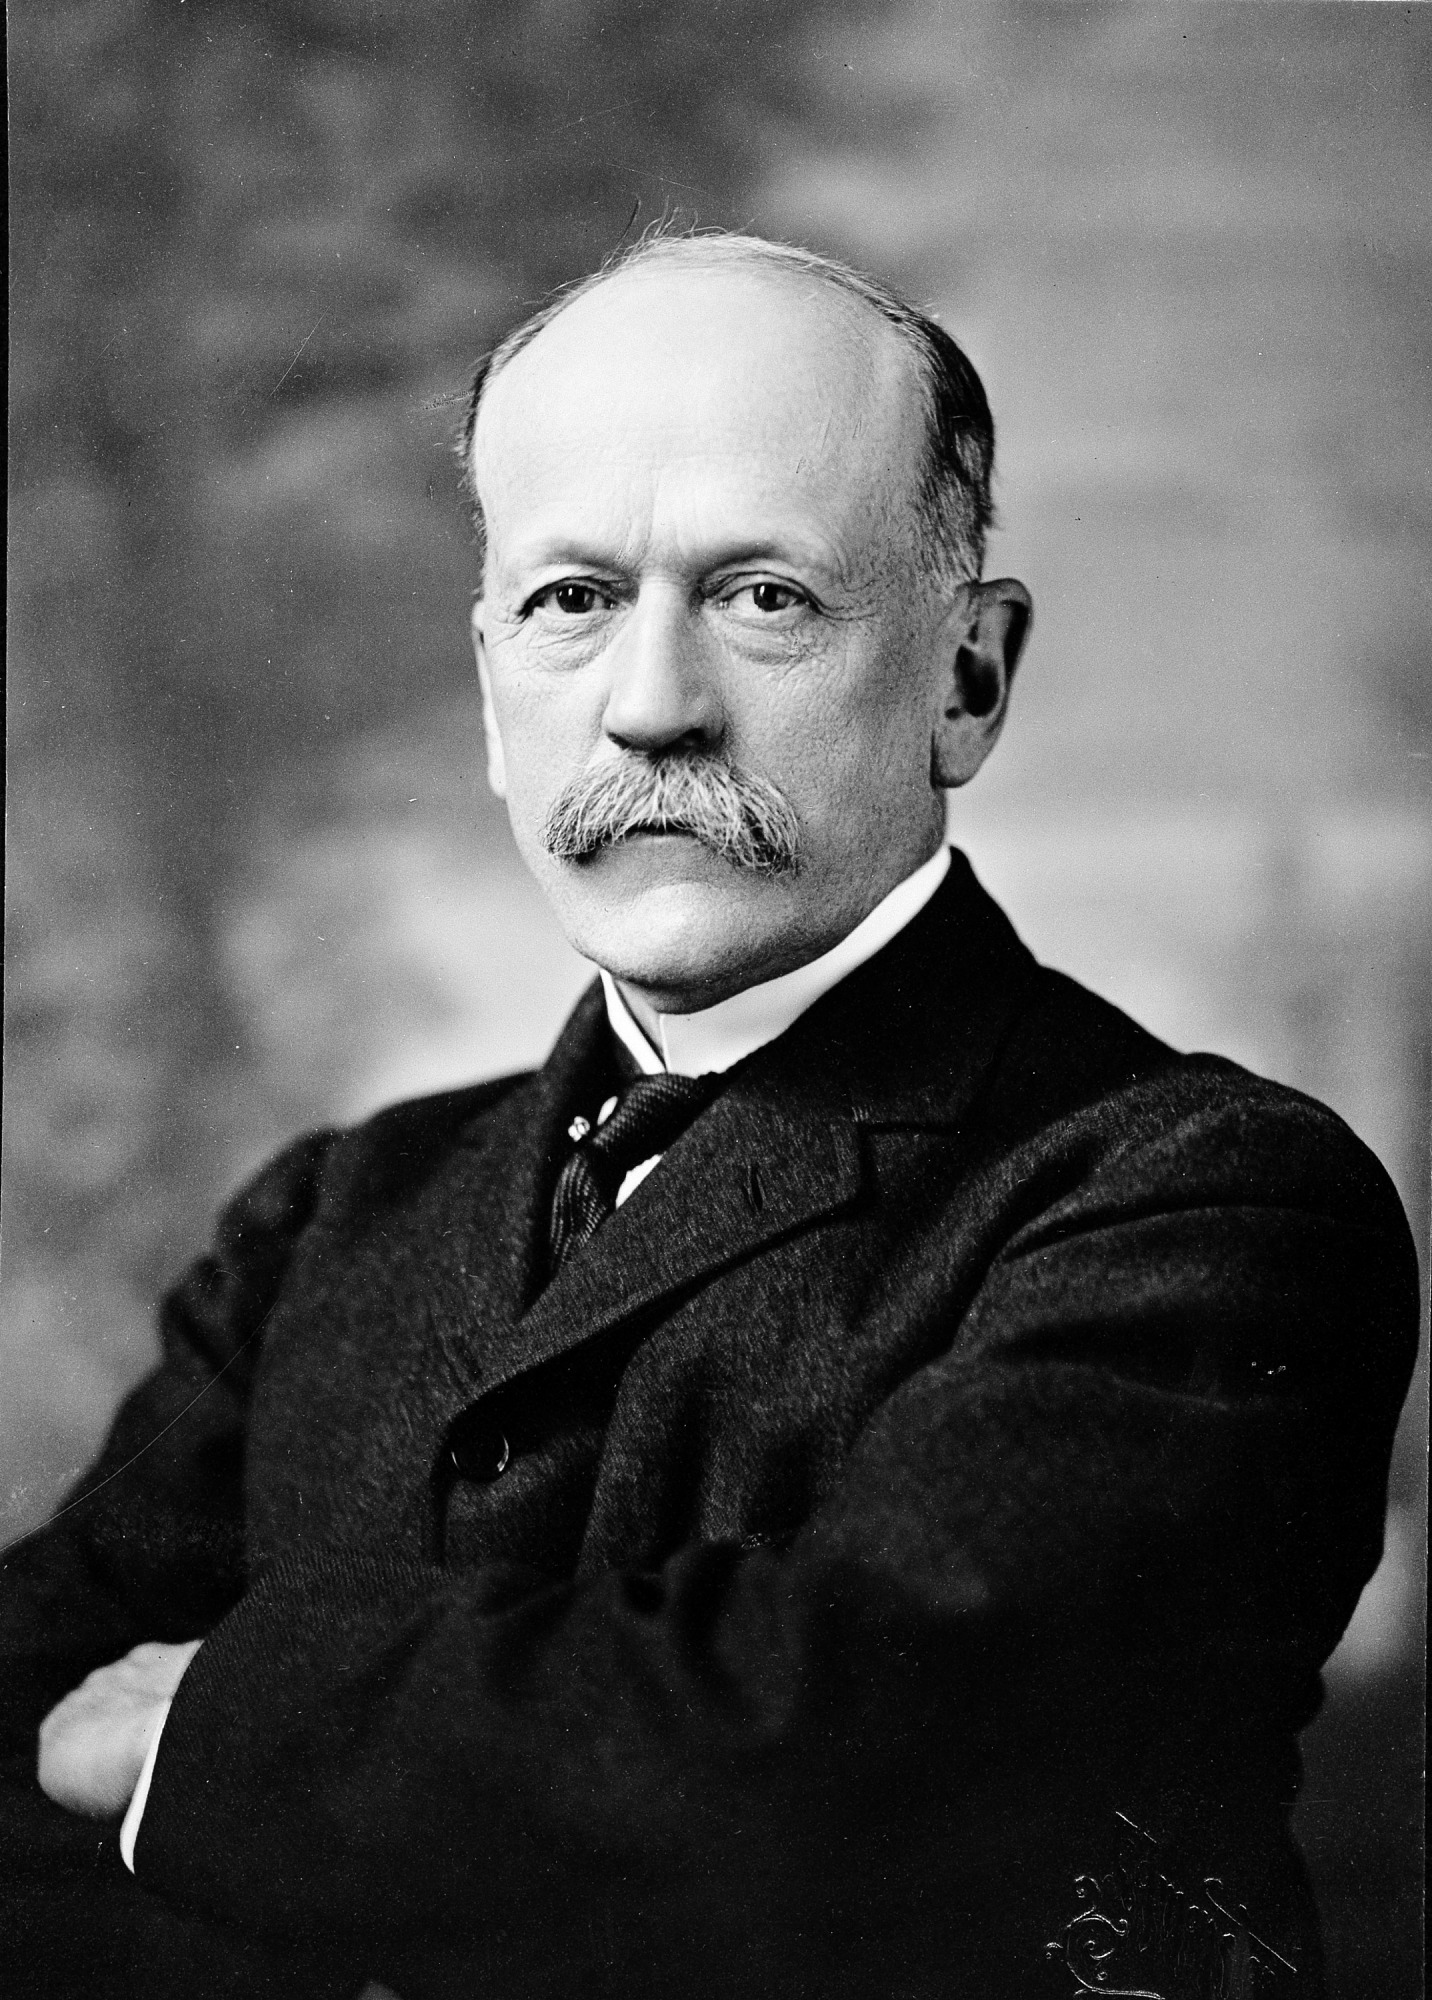 Secretary Charles D. Walcott, by Edmonston, c. 1900, Smithsonian Archives - History Div, 82-3142.